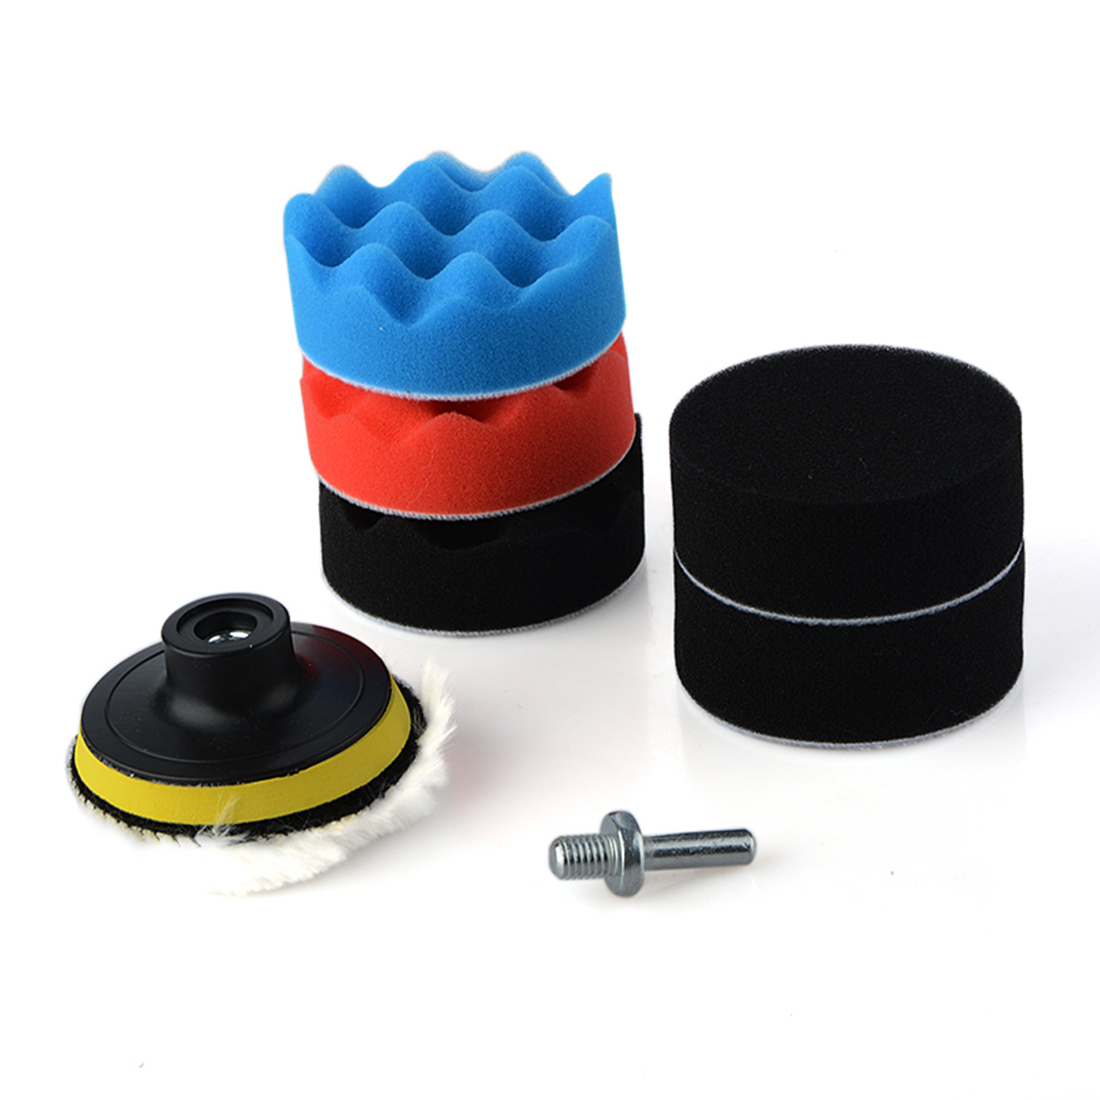 Aliexpress.com : Buy 8Pcs/Set 3inch Polishing Buffing Pad